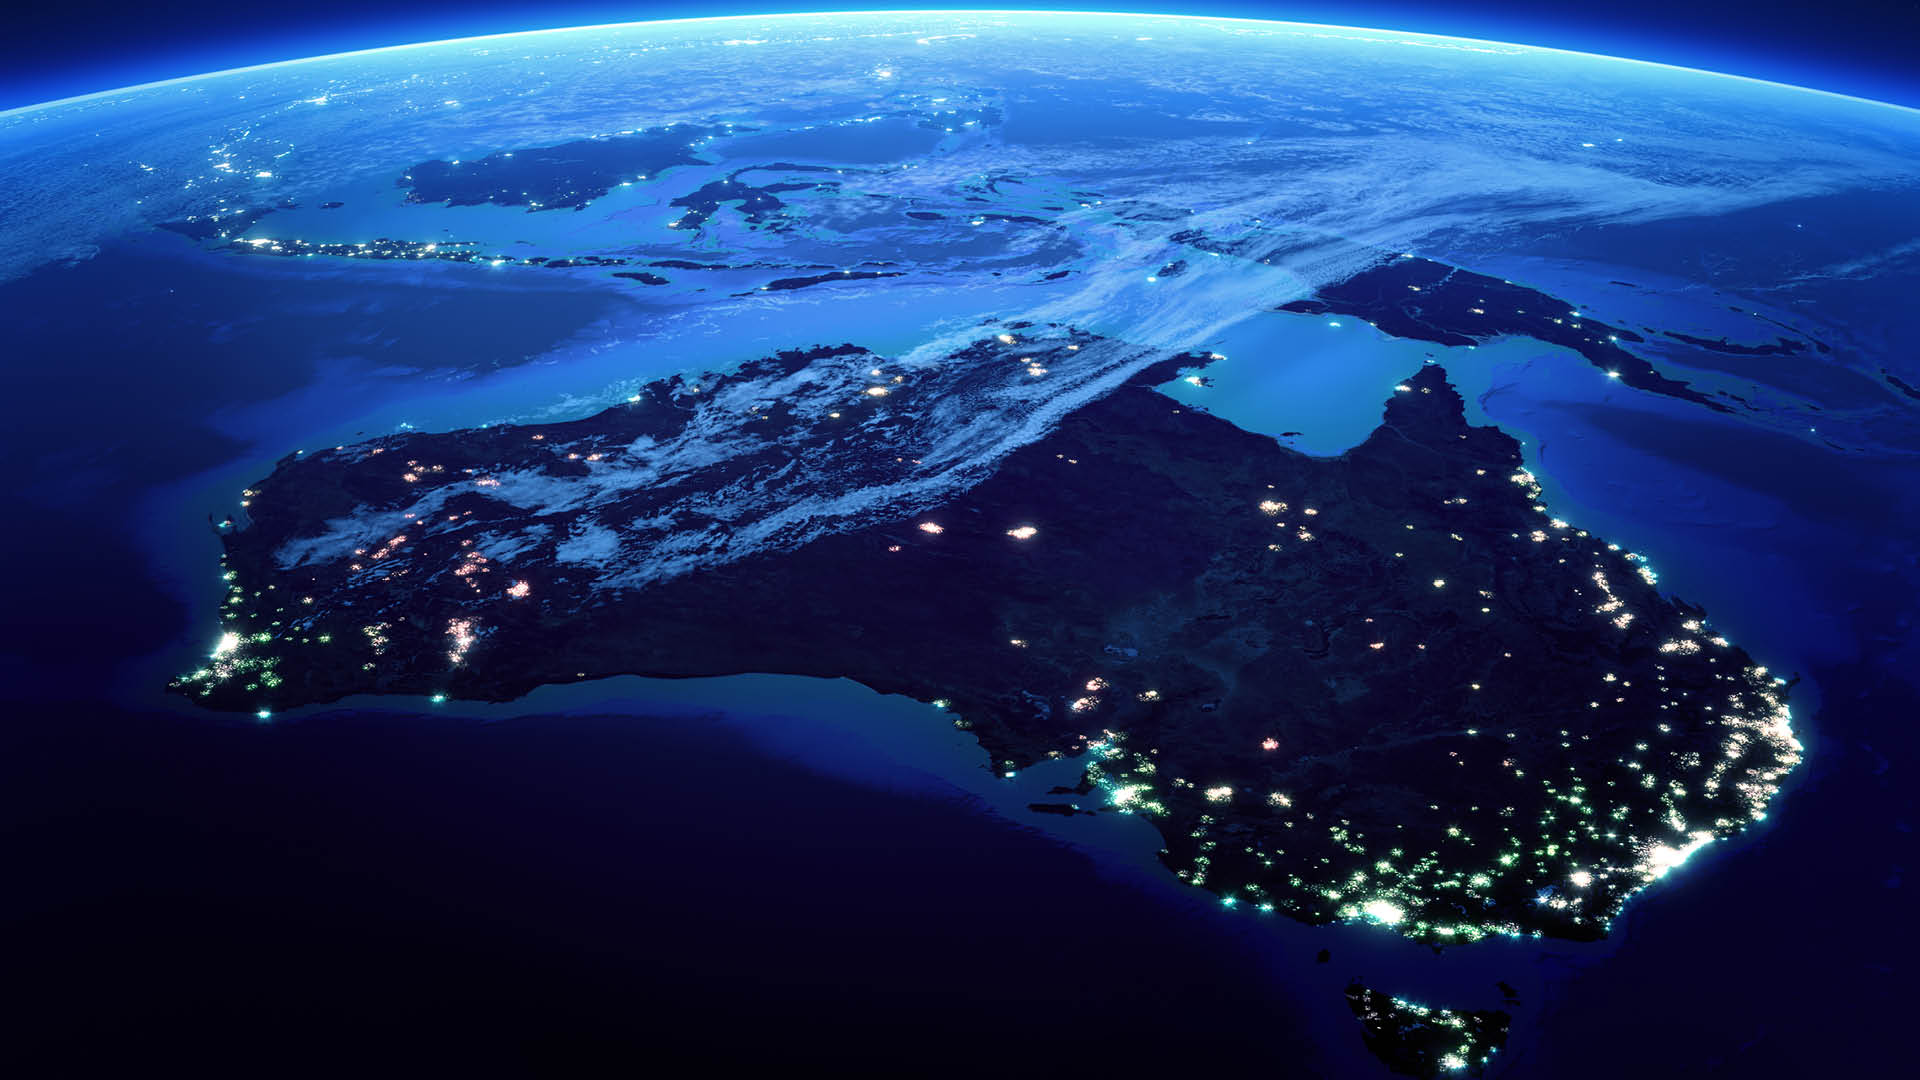 Australia-globe-earth-lights-night-blue